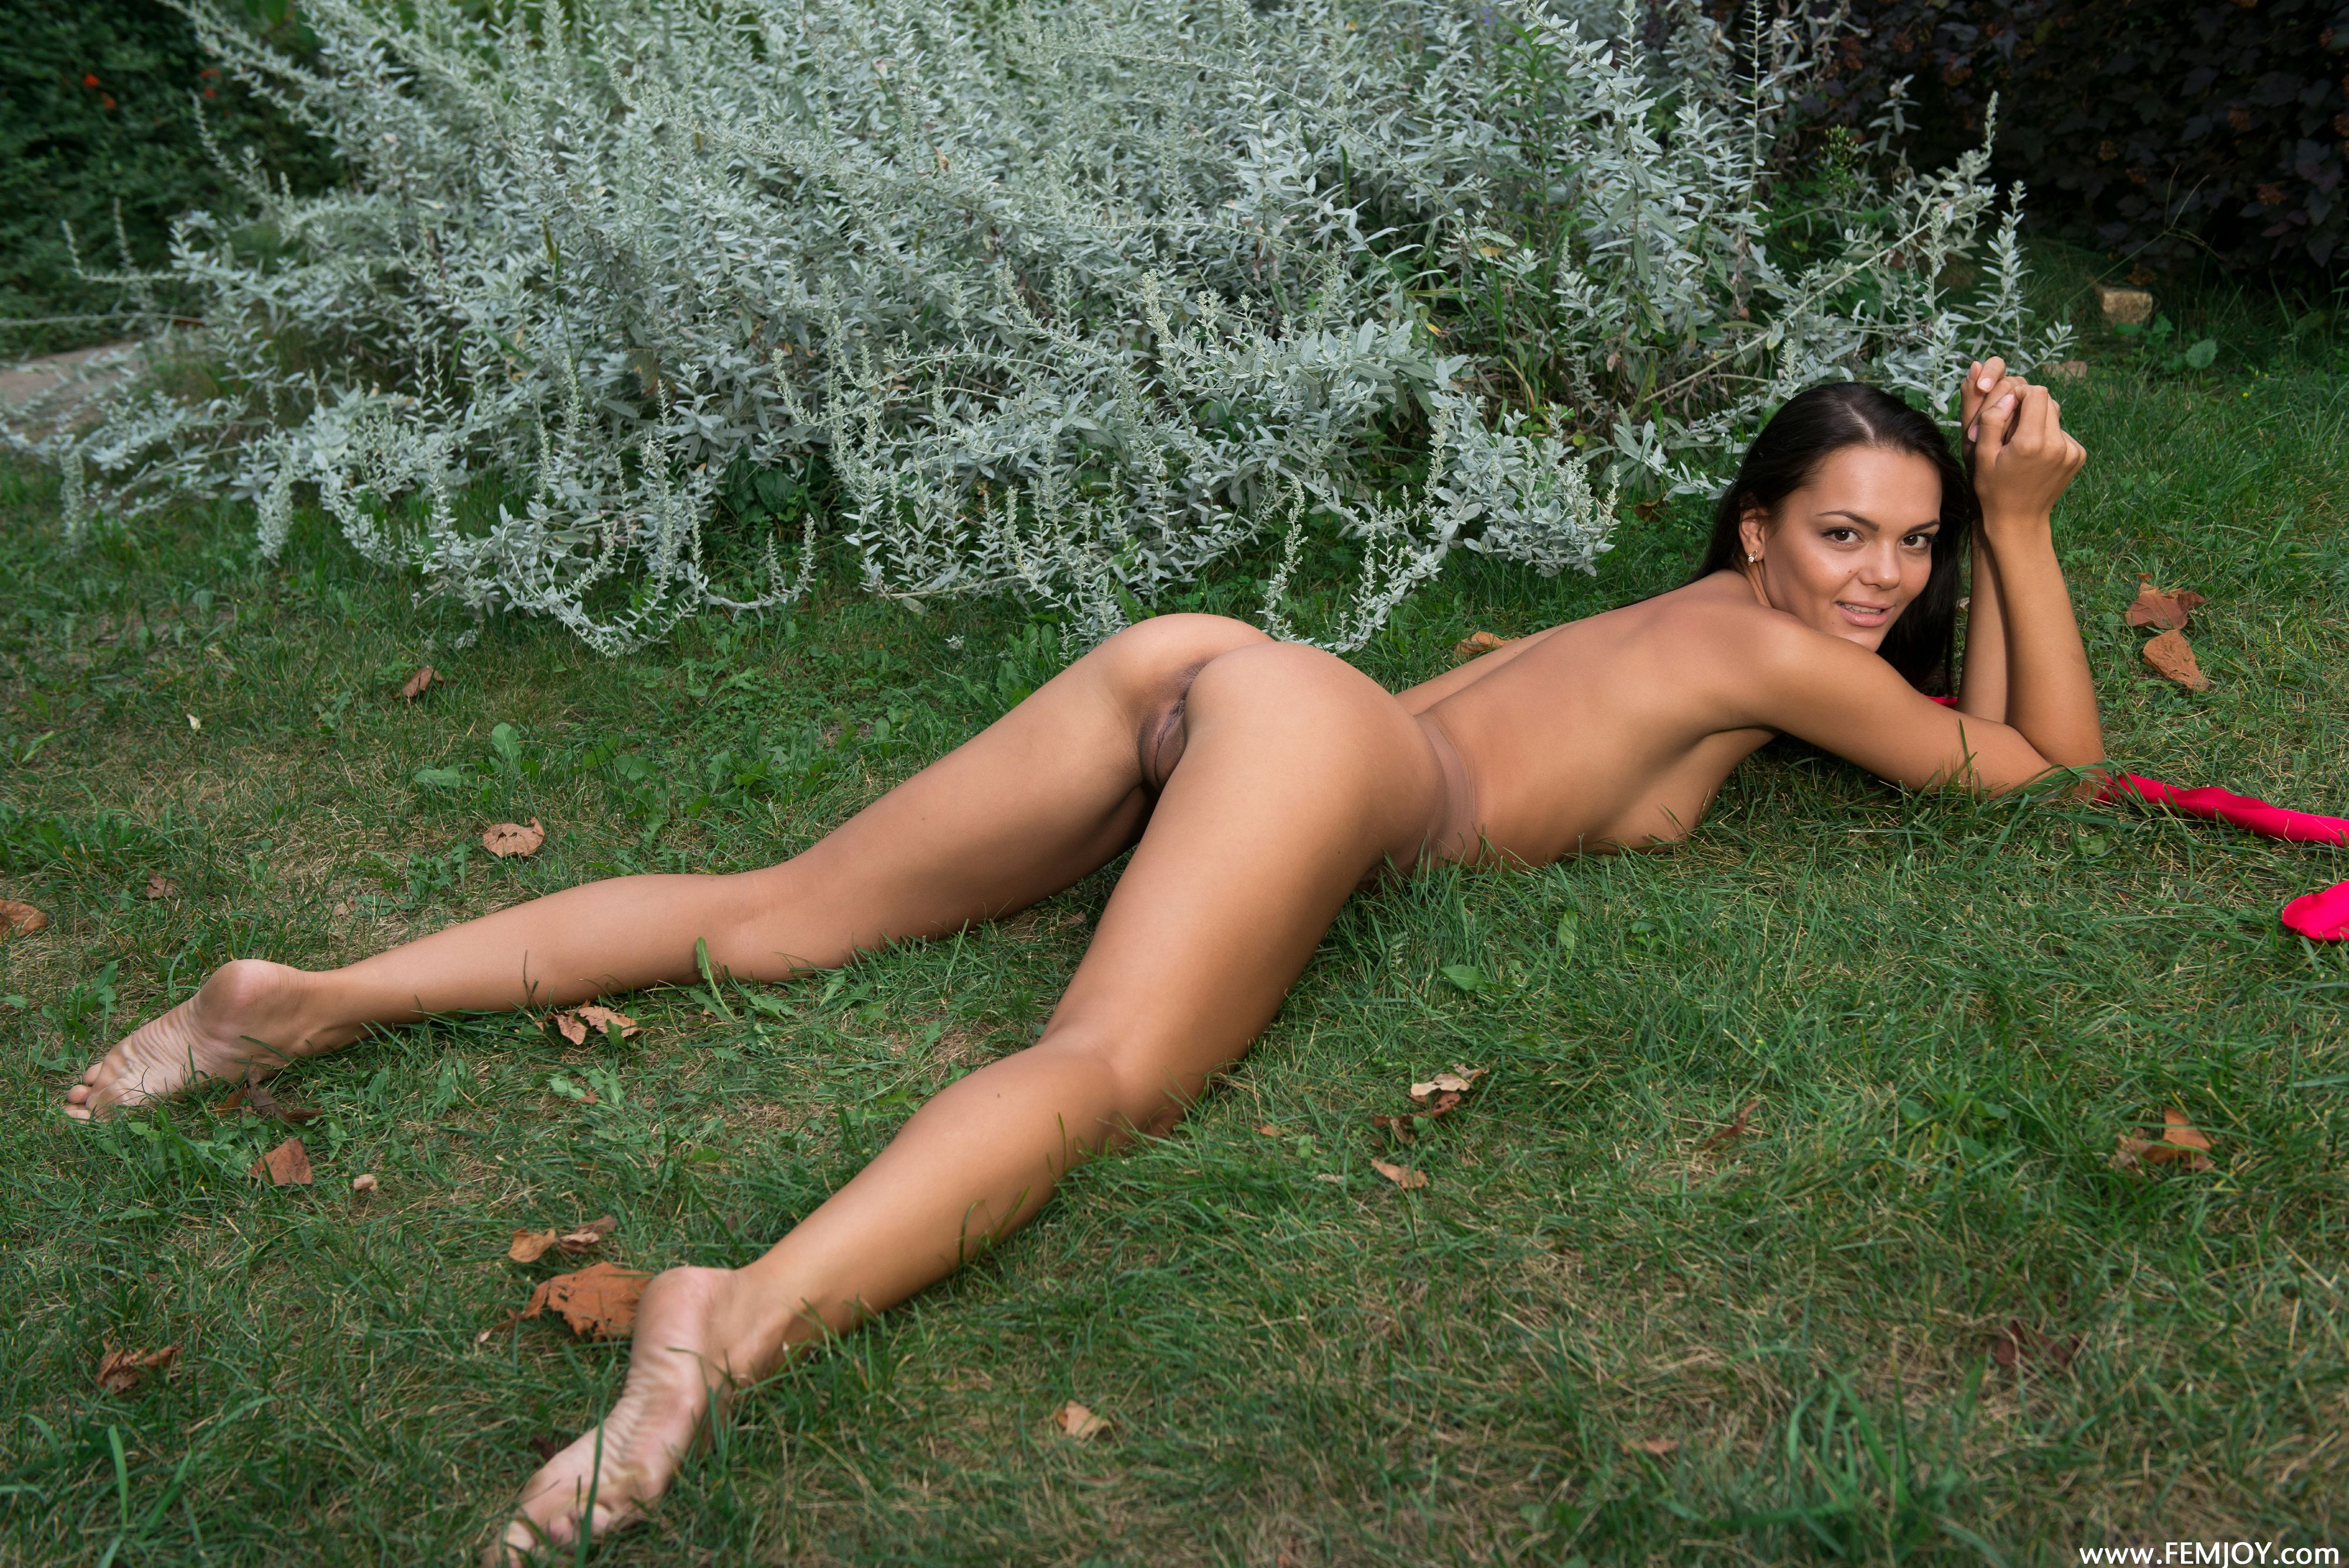 shaved tan brunette indian women nude